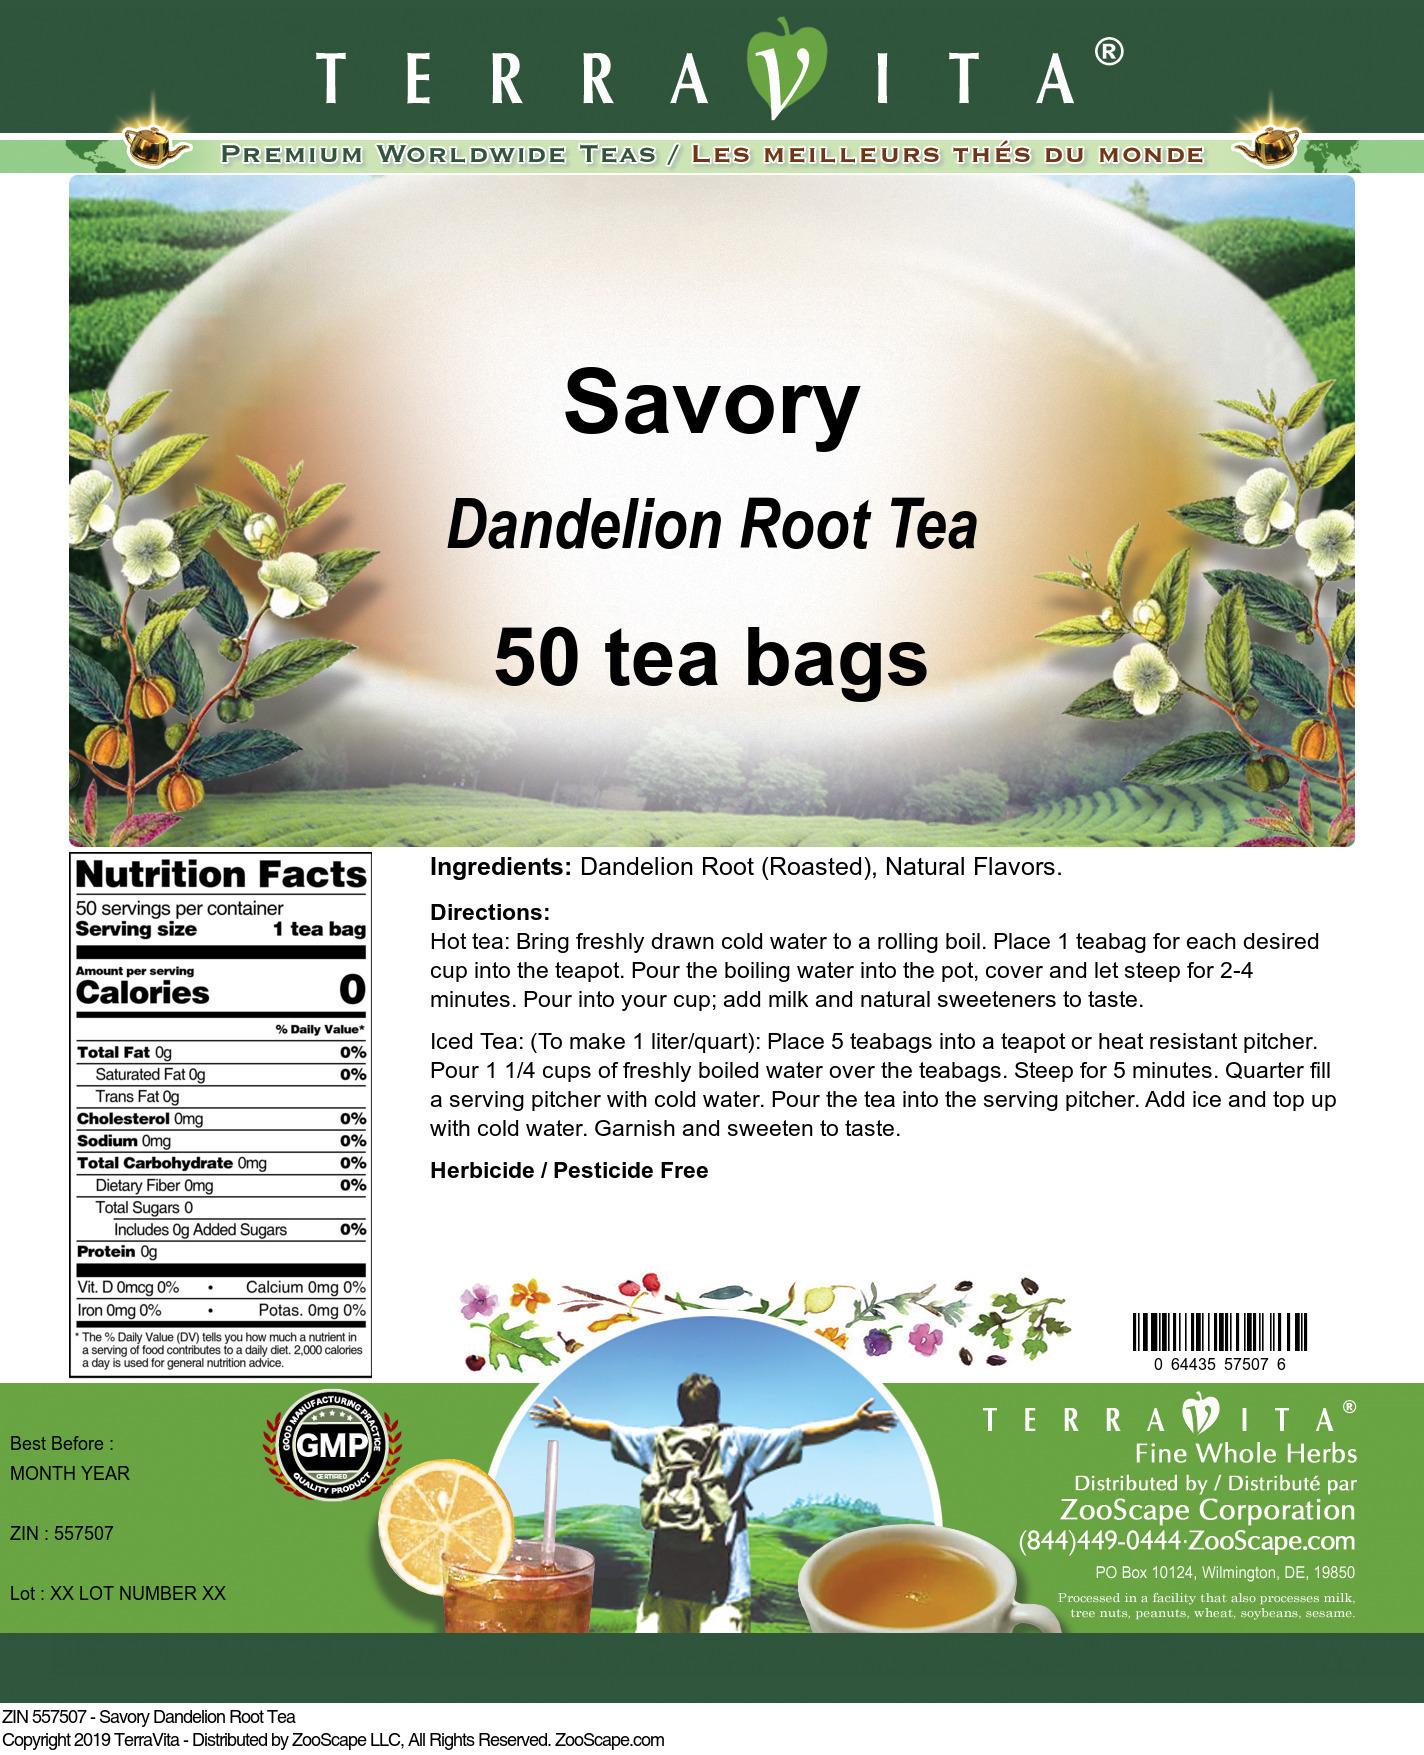 Savory Dandelion Root